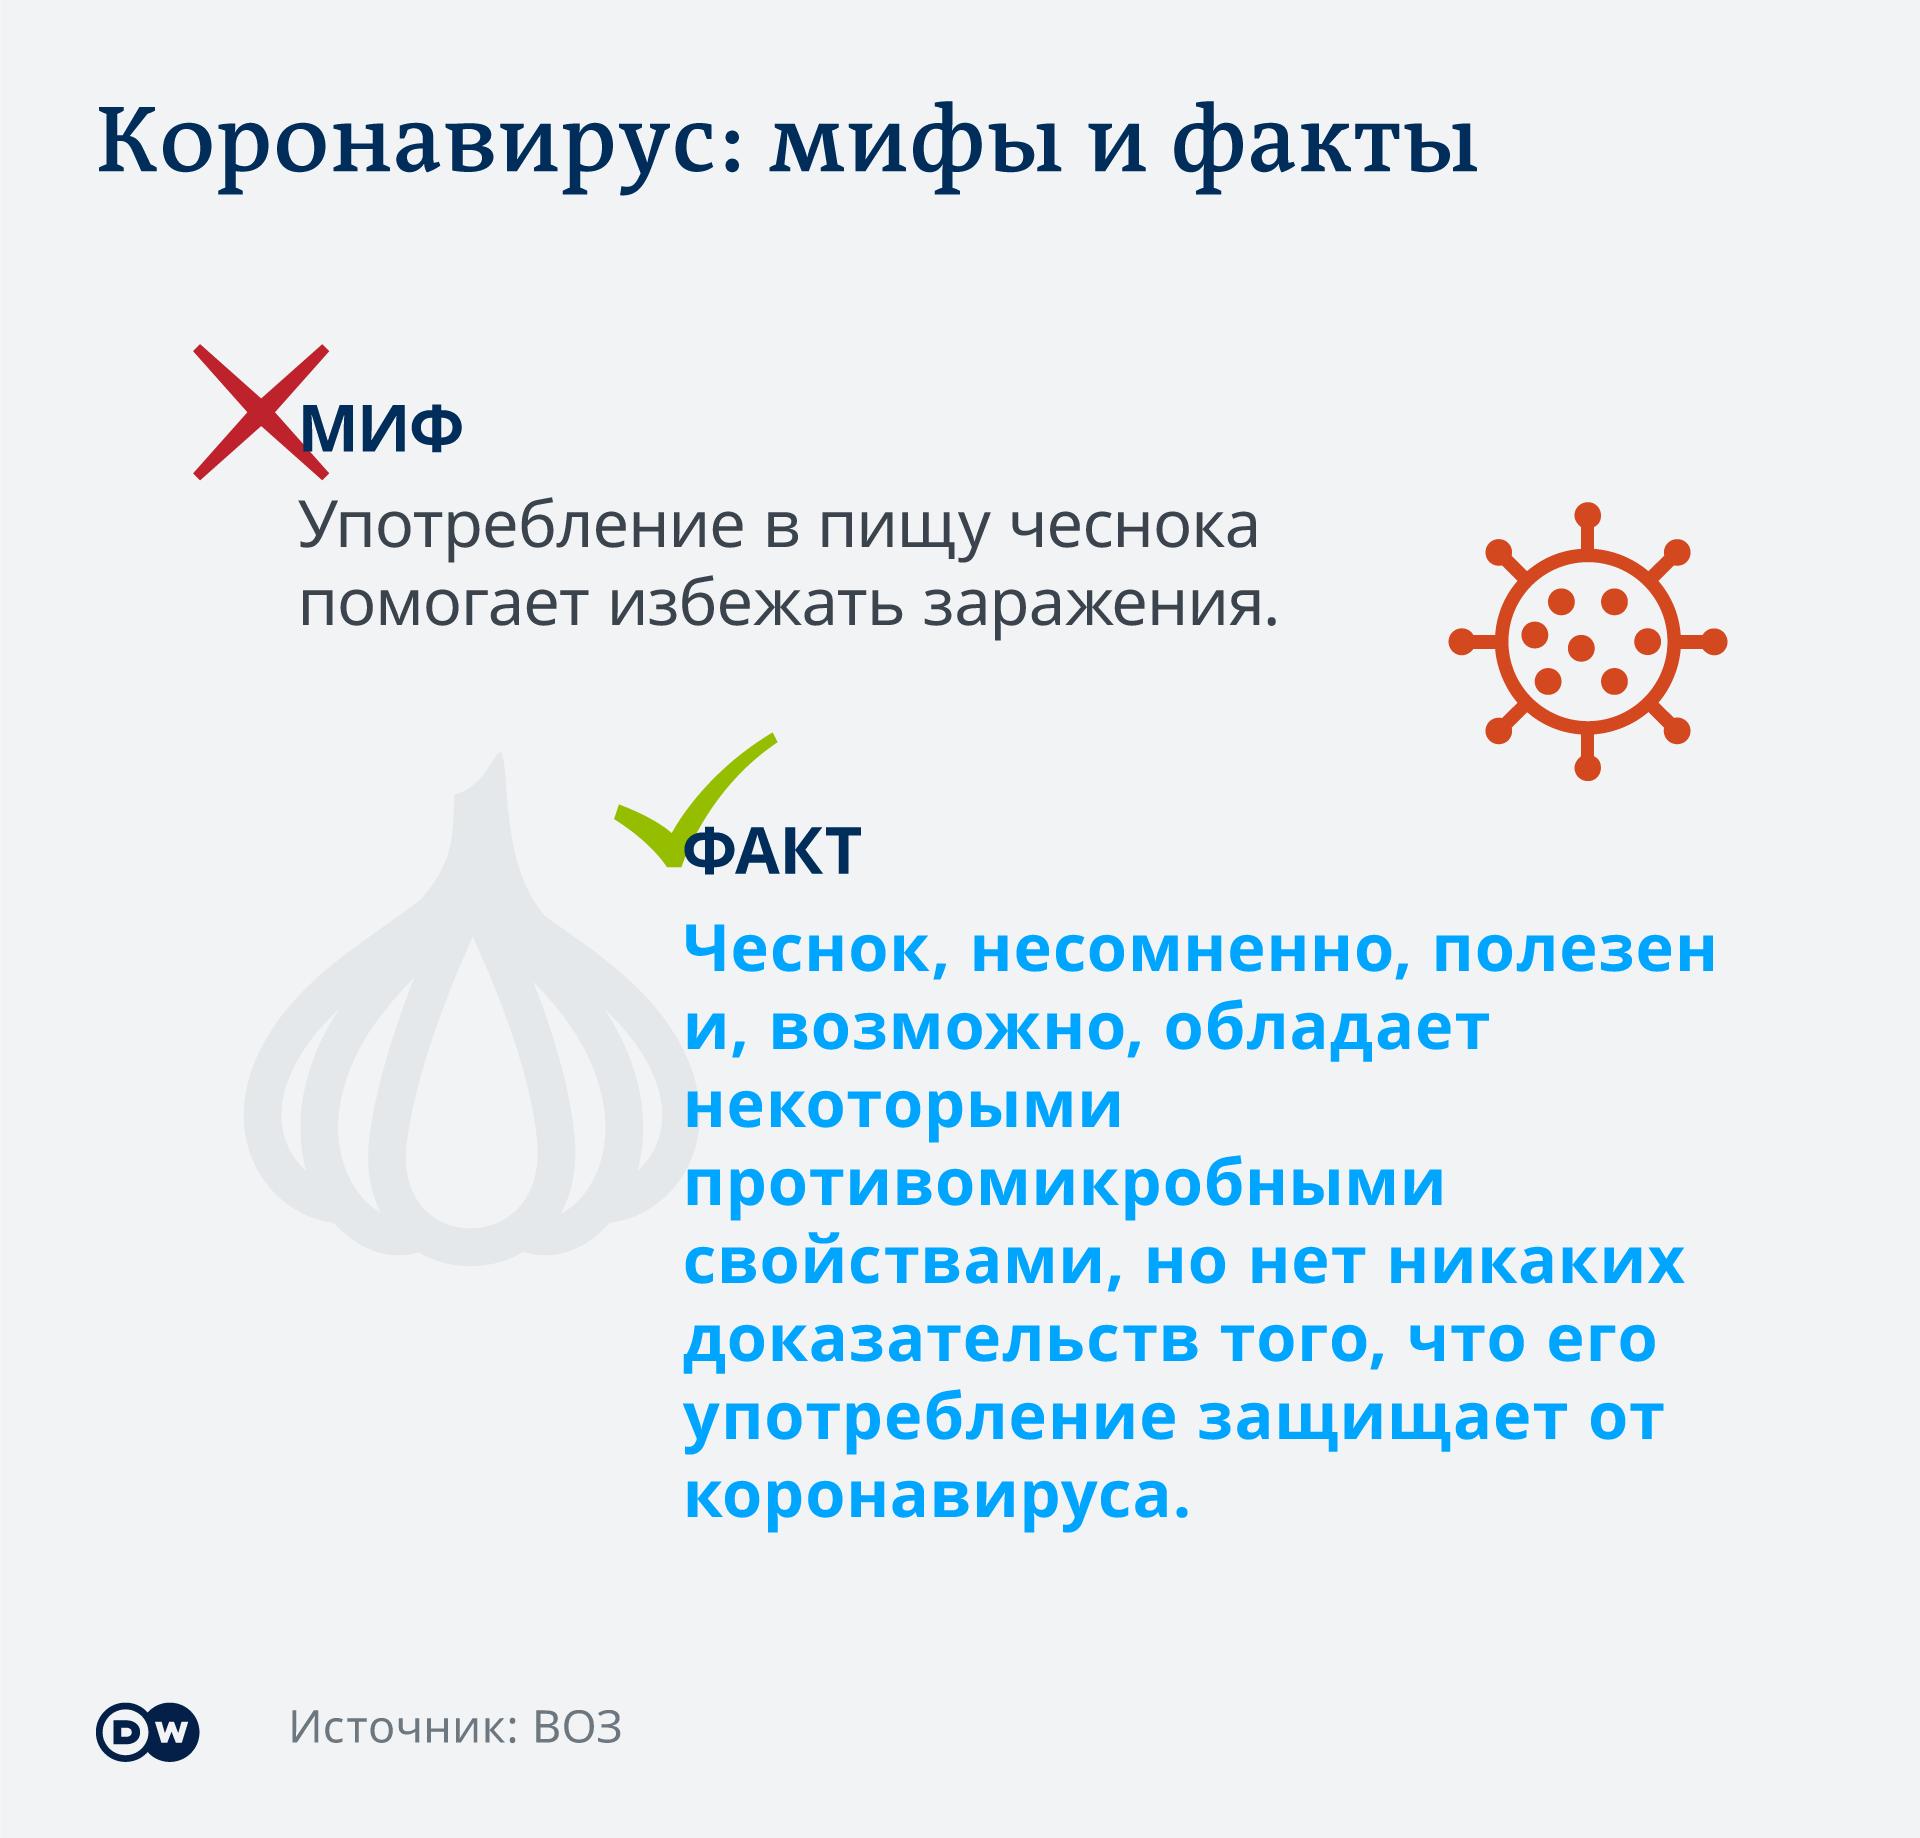 Infografik Coronavirus Mythen Tatsachen Knoblauch RU